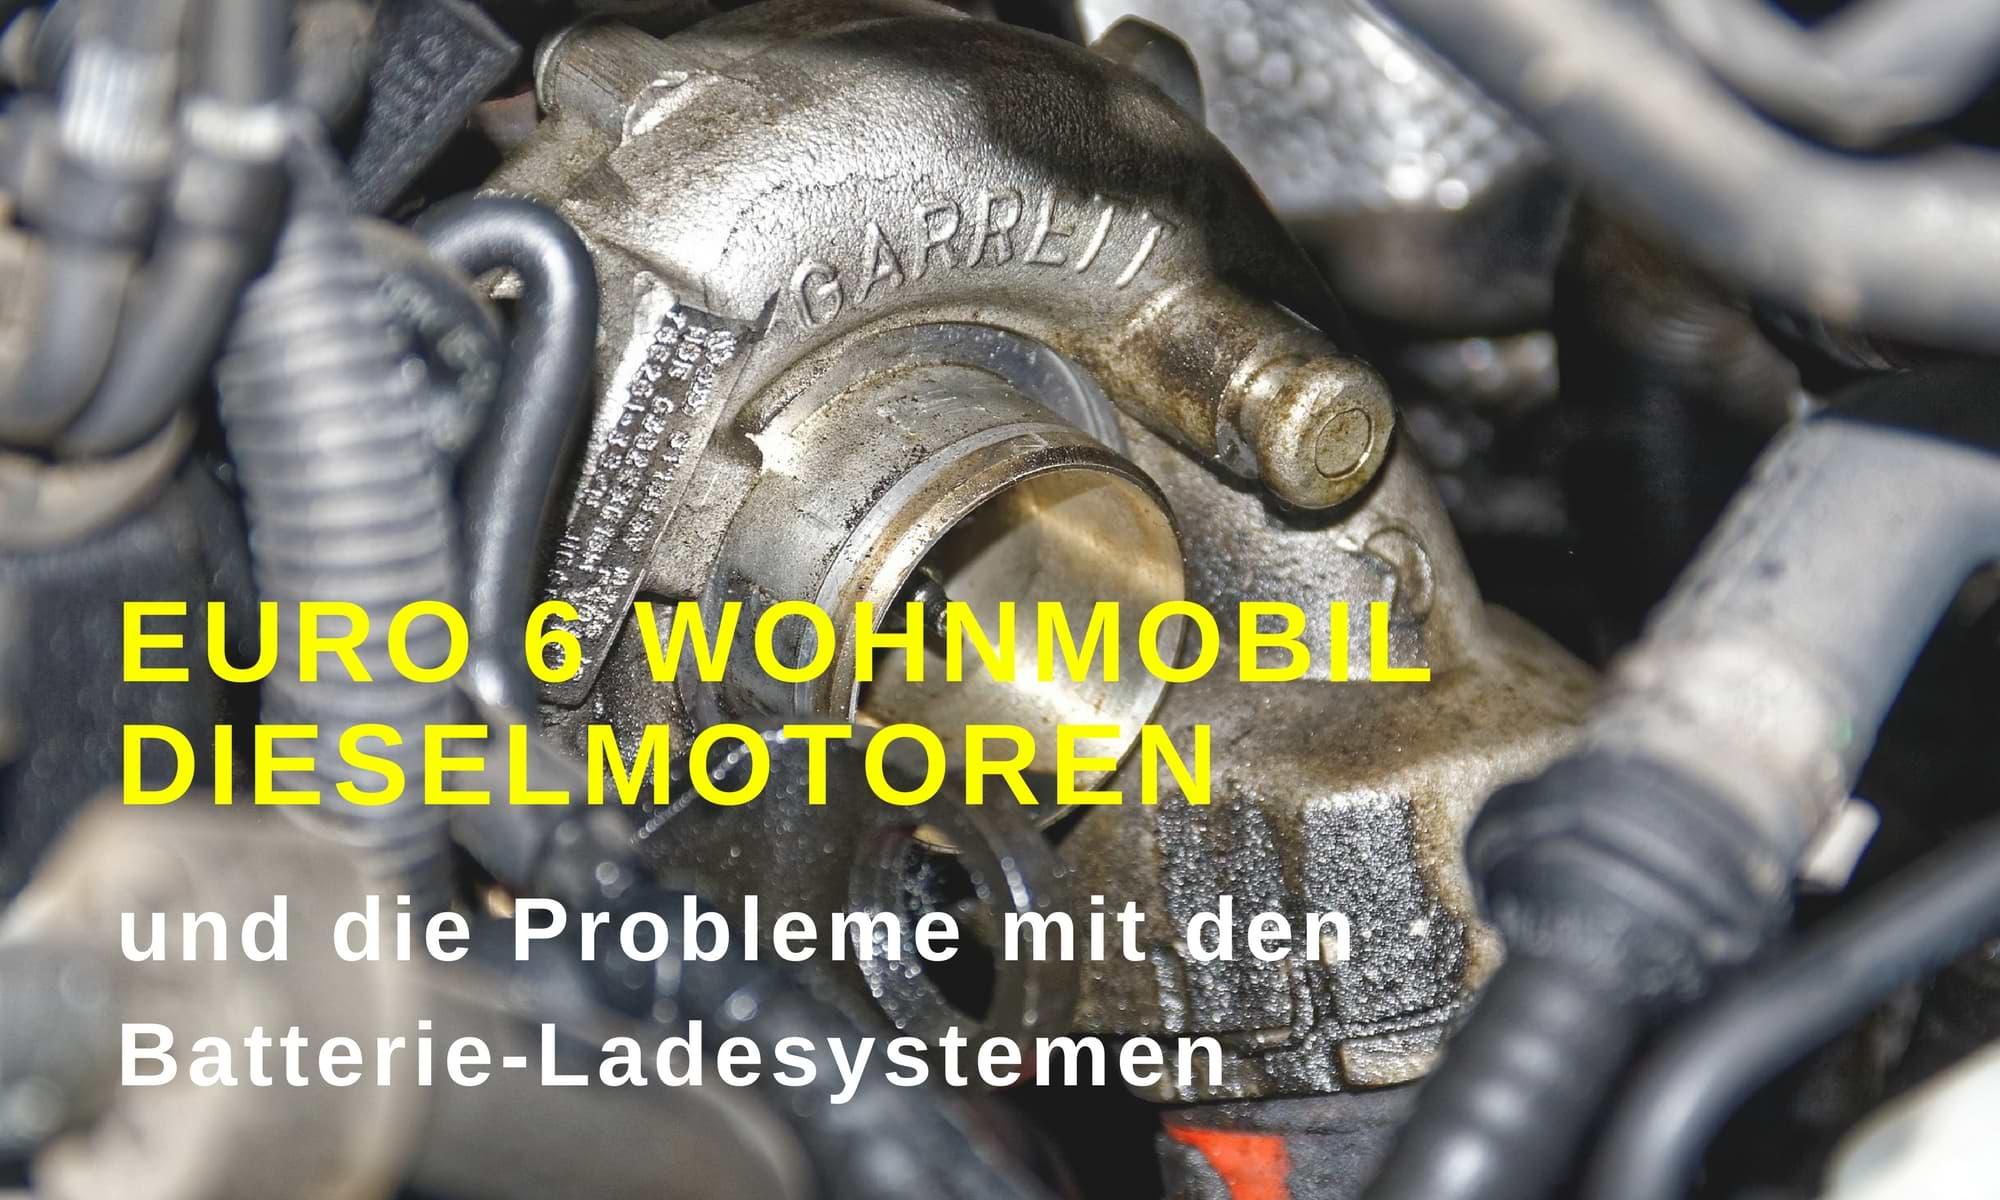 euro 6 wohnmobil motoren ladeprobleme